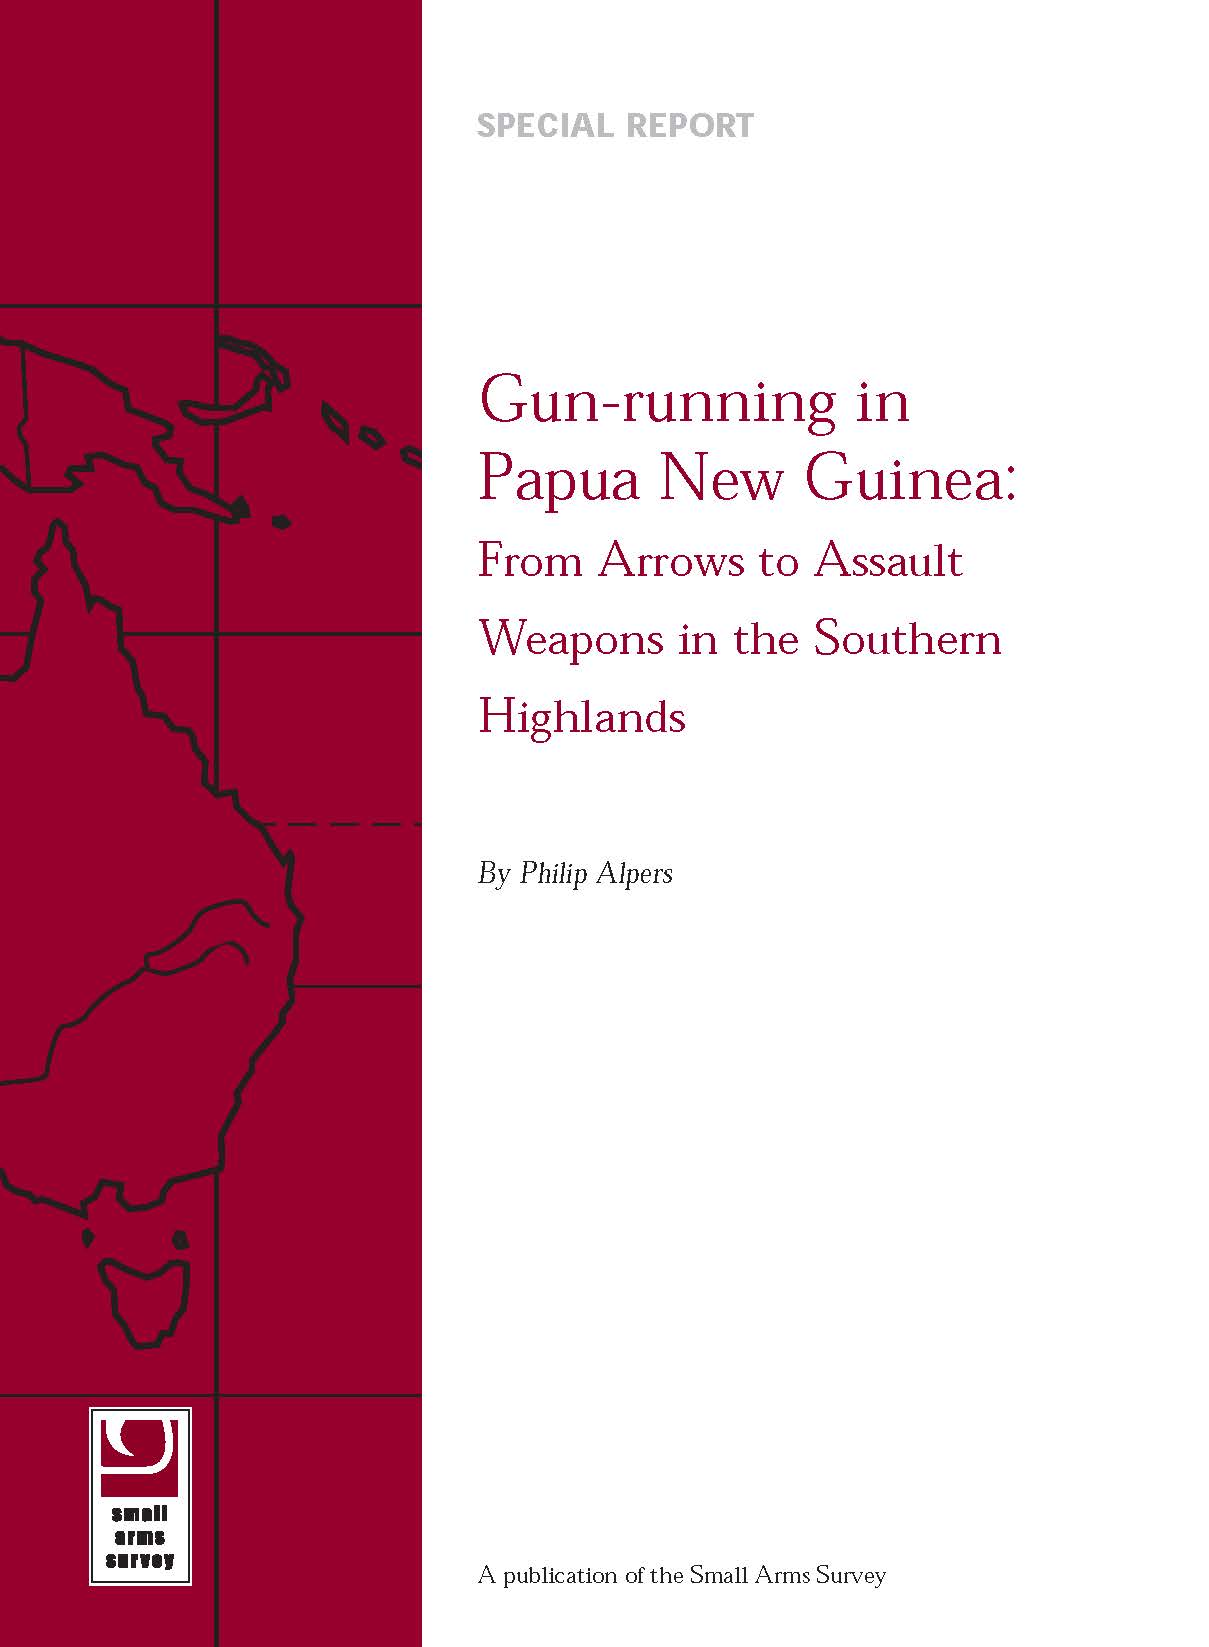 Alpers SAS PNG SR5 Gunrunning In Papua New Guinea